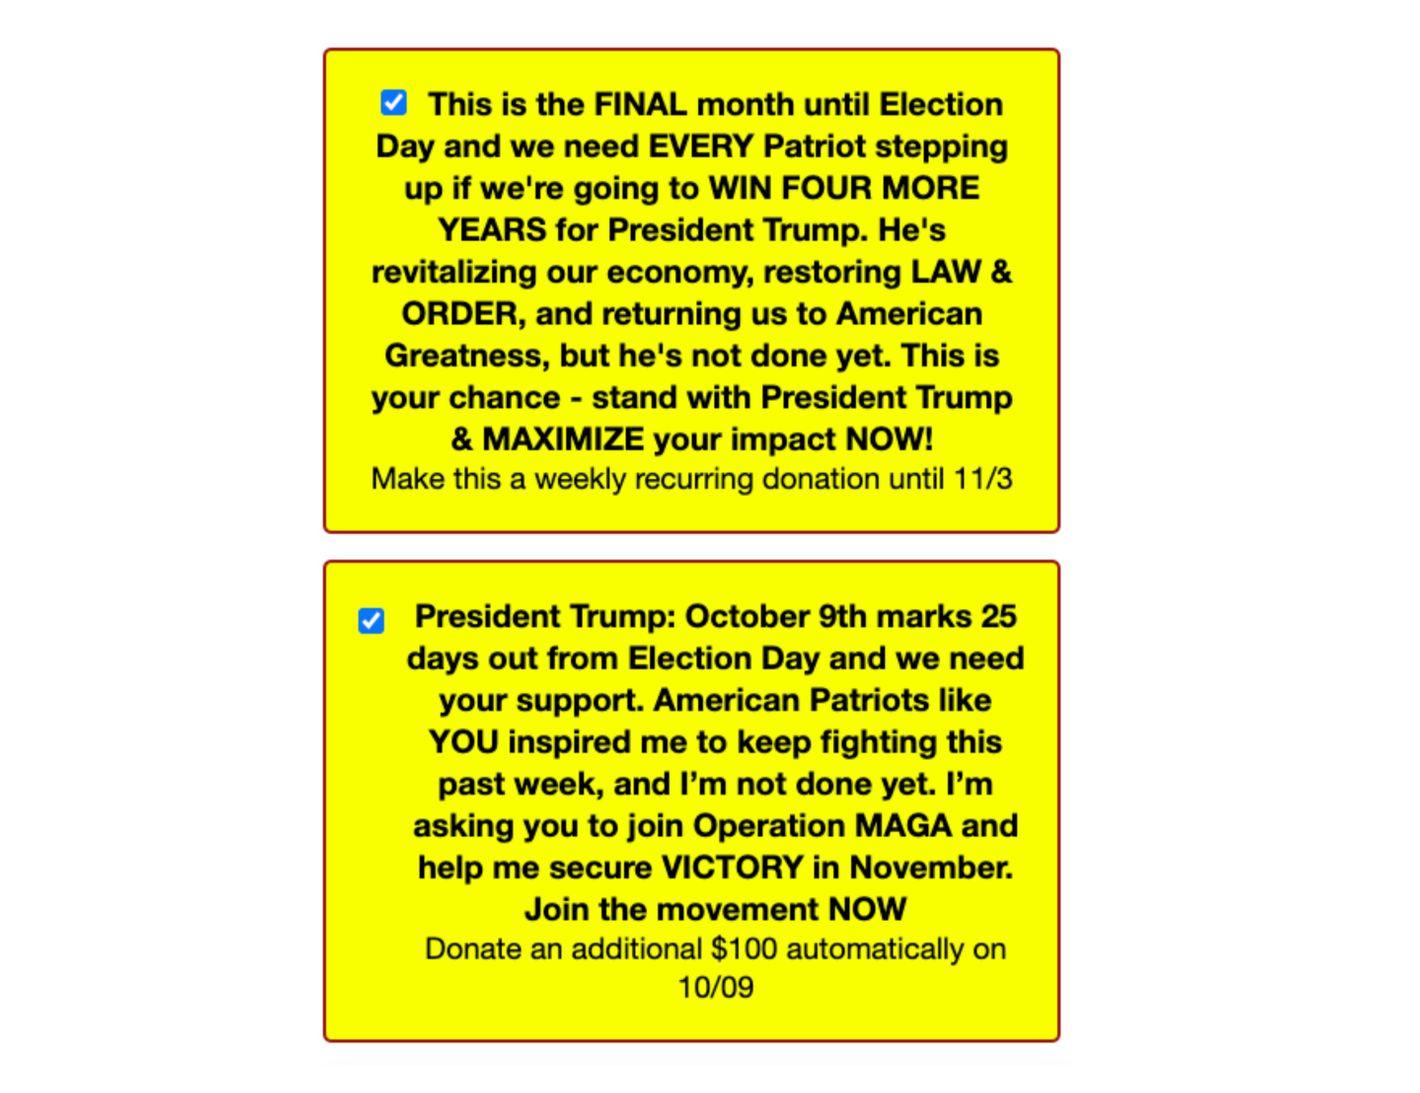 028e3fc8cc19458ea834acd093e20fd3a6-trump-campaign-fine-print-screenshot-nyt.2x.w710.jpg